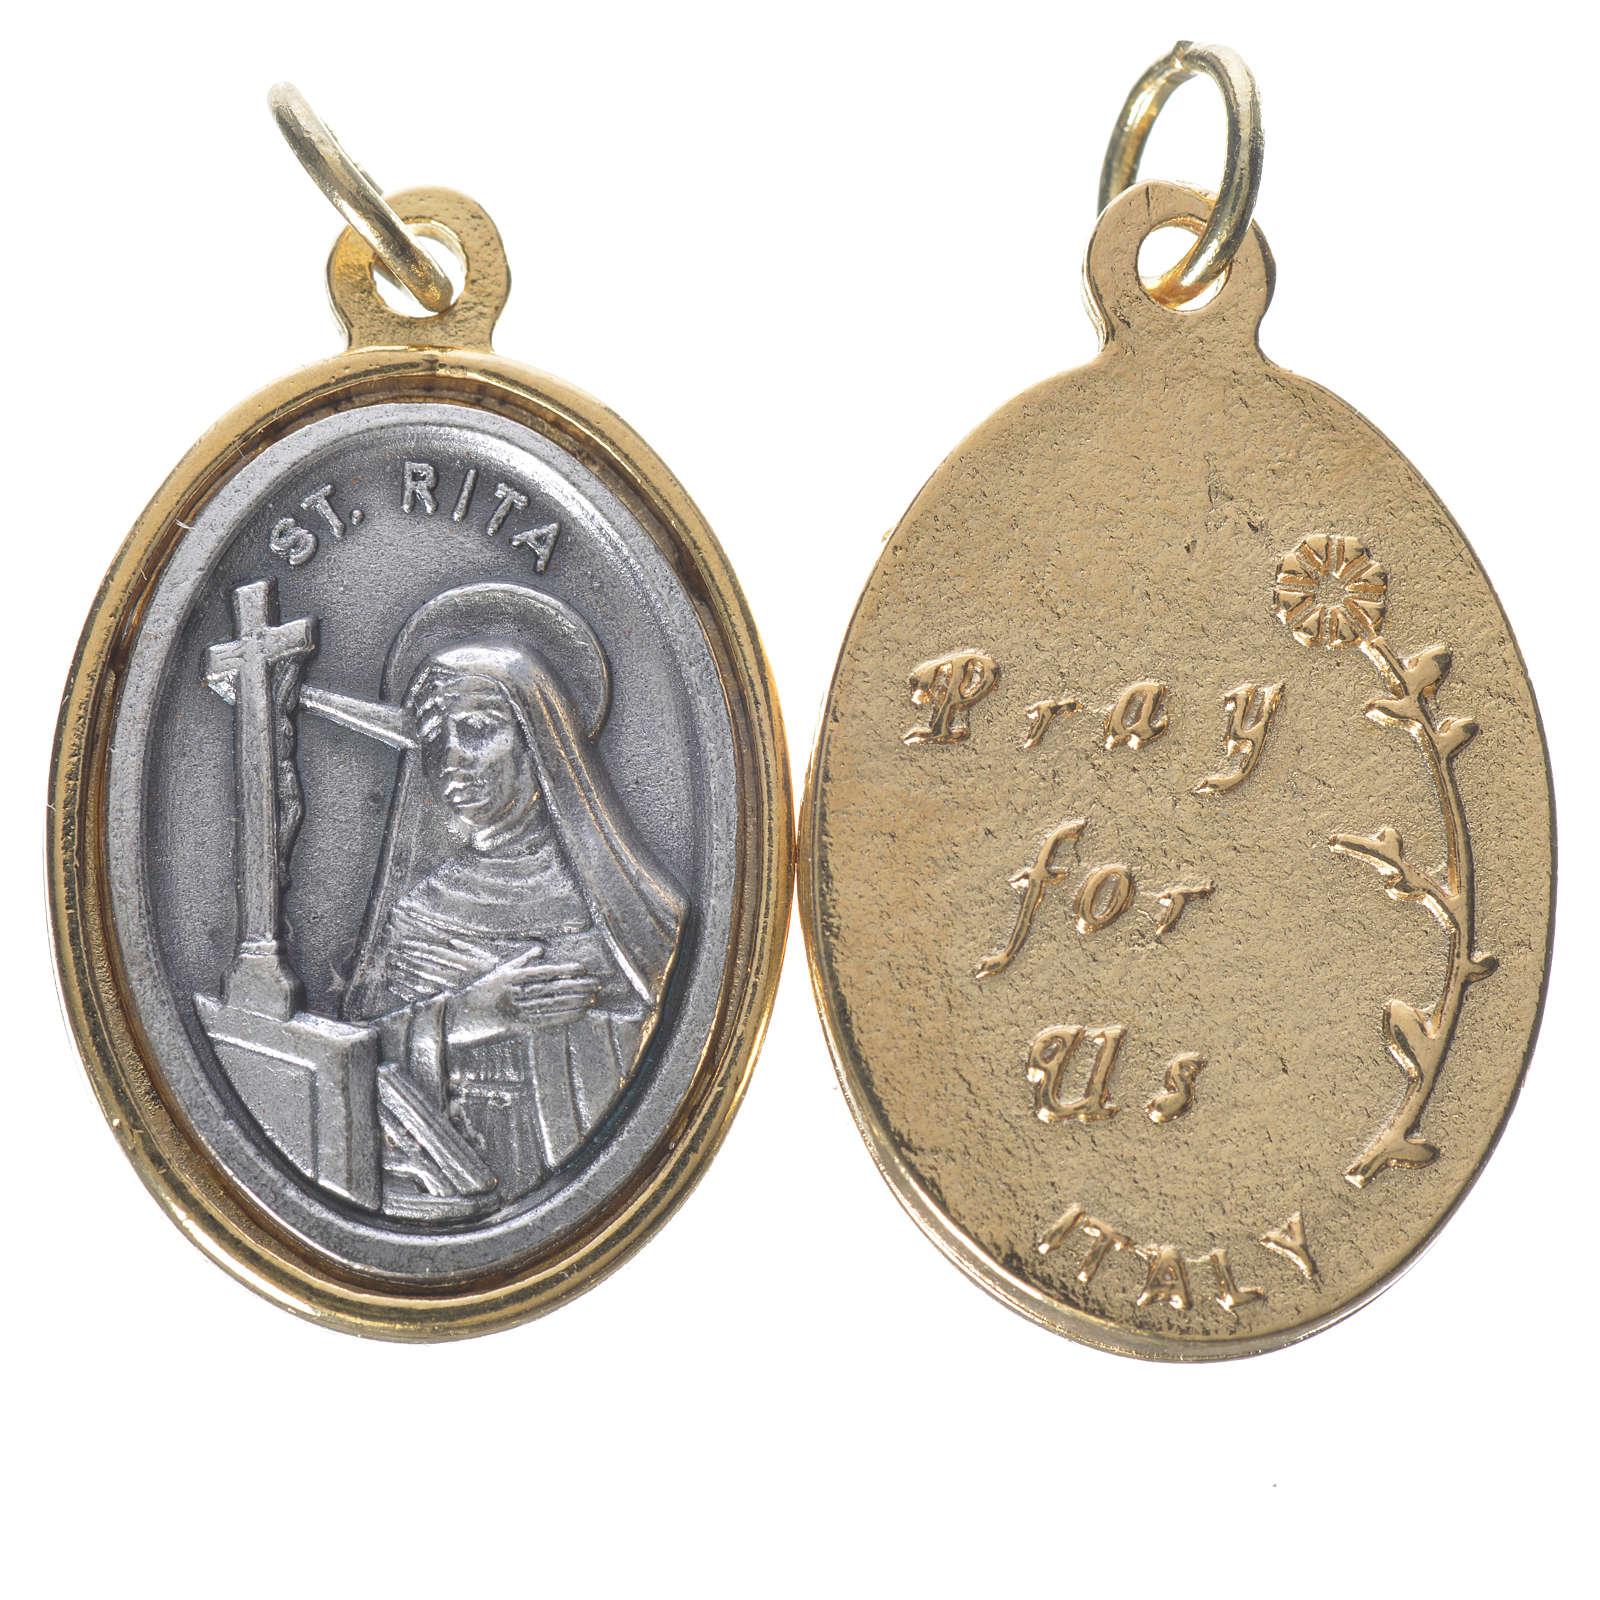 Saint Rita silver and golden medal 2.5cm 4